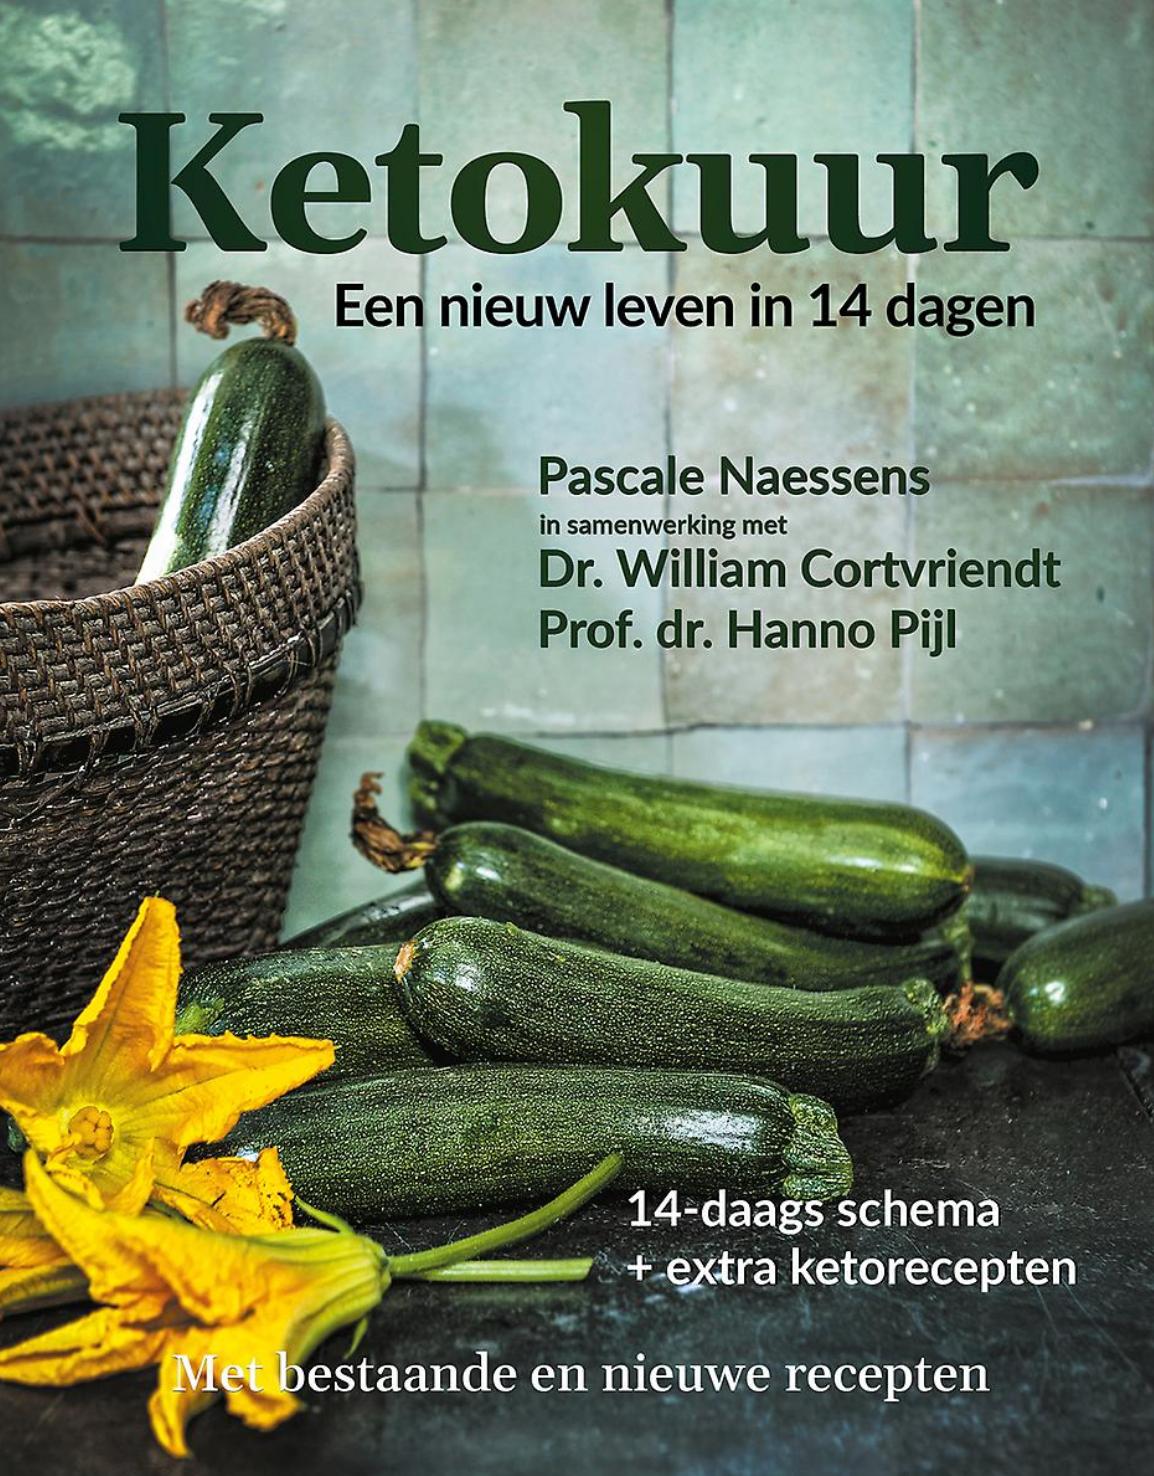 Ketokuur Pascale Naessens-1